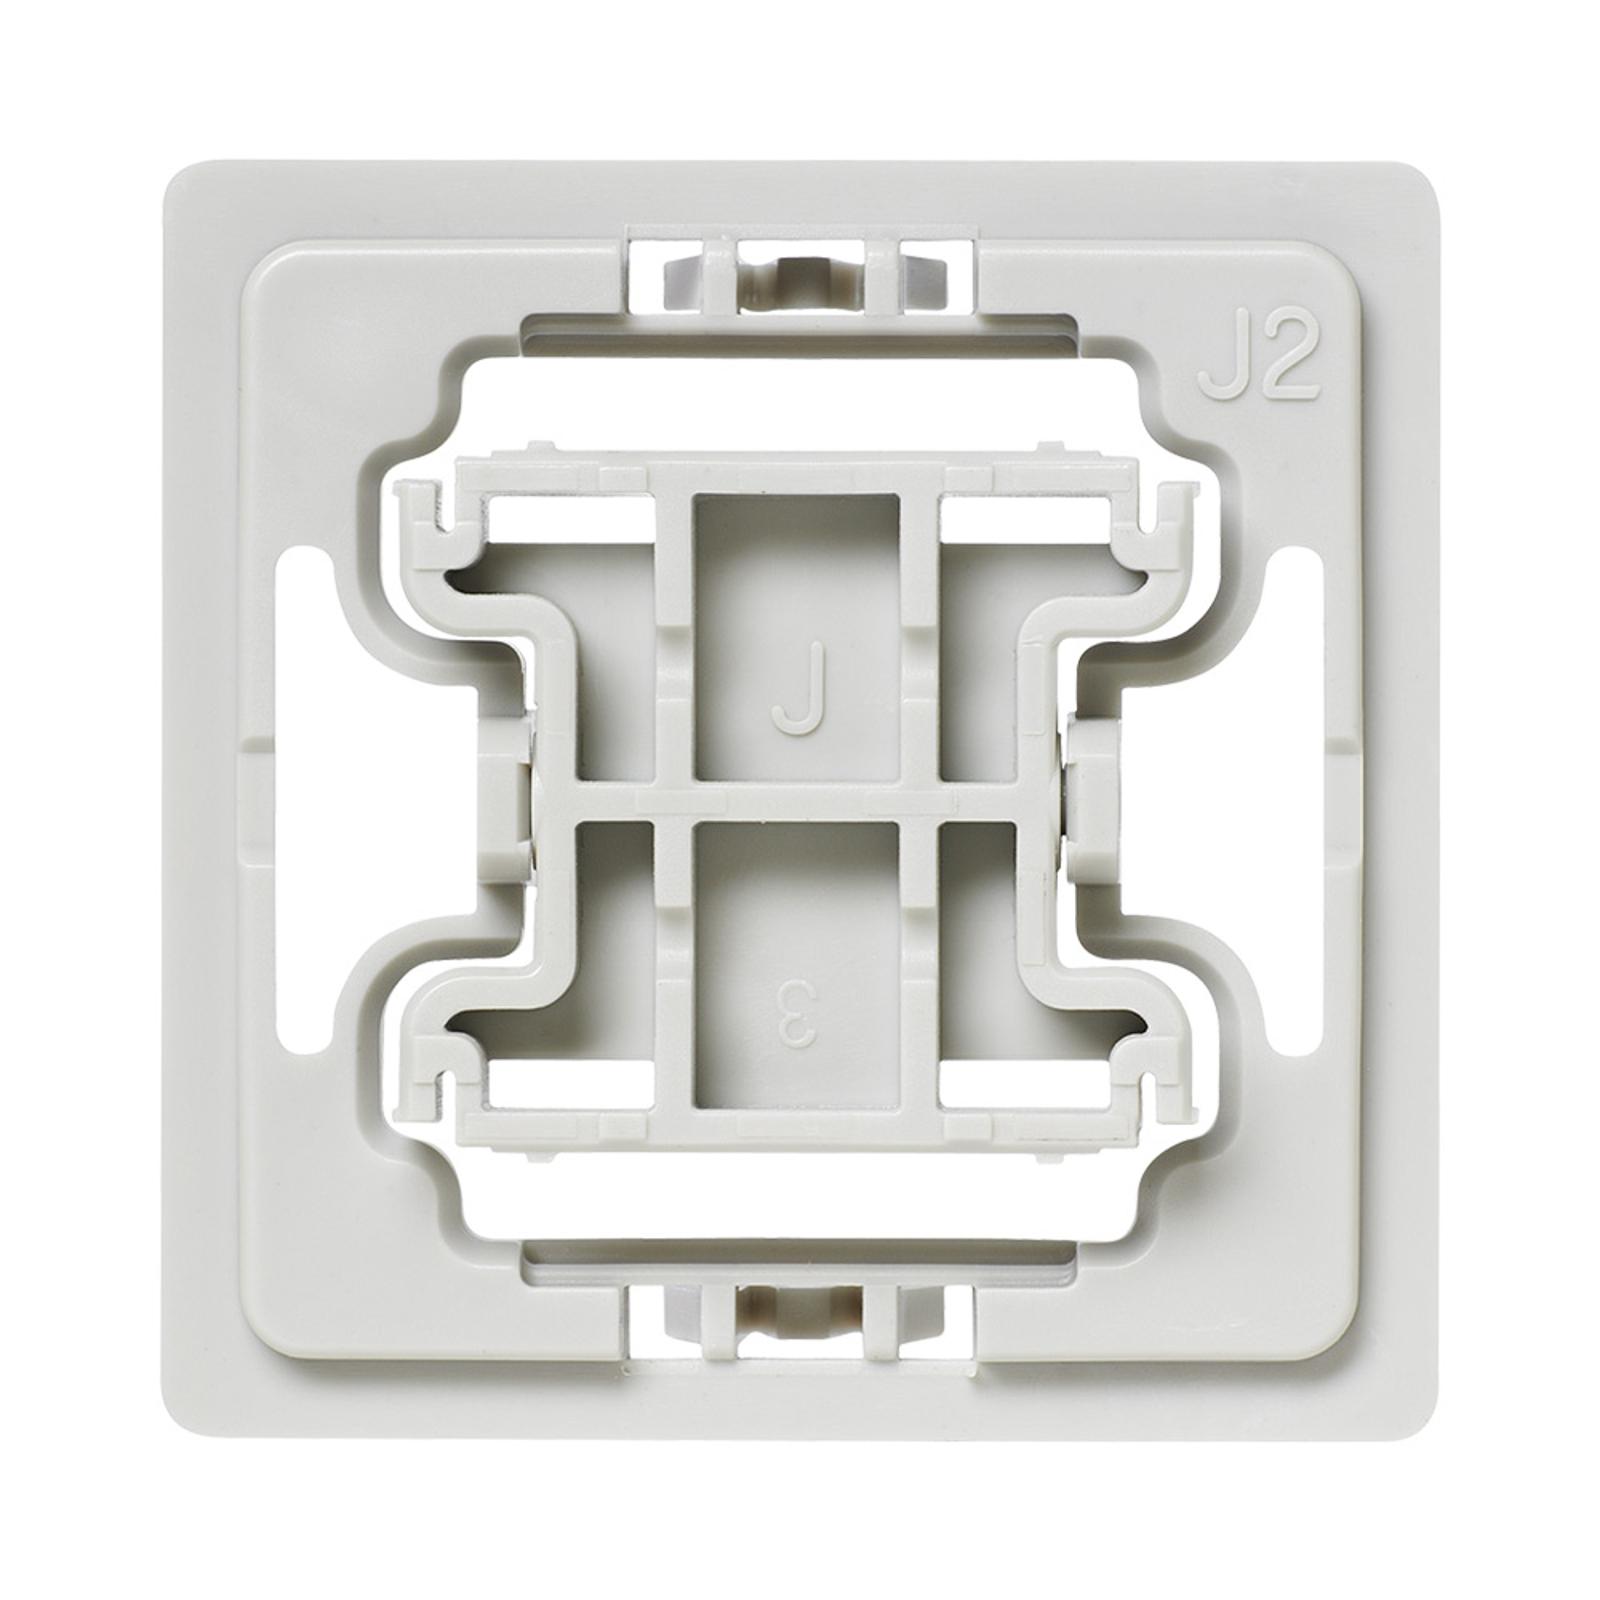 Homematic IP adaptateur interrupteurs Jung J2 1x